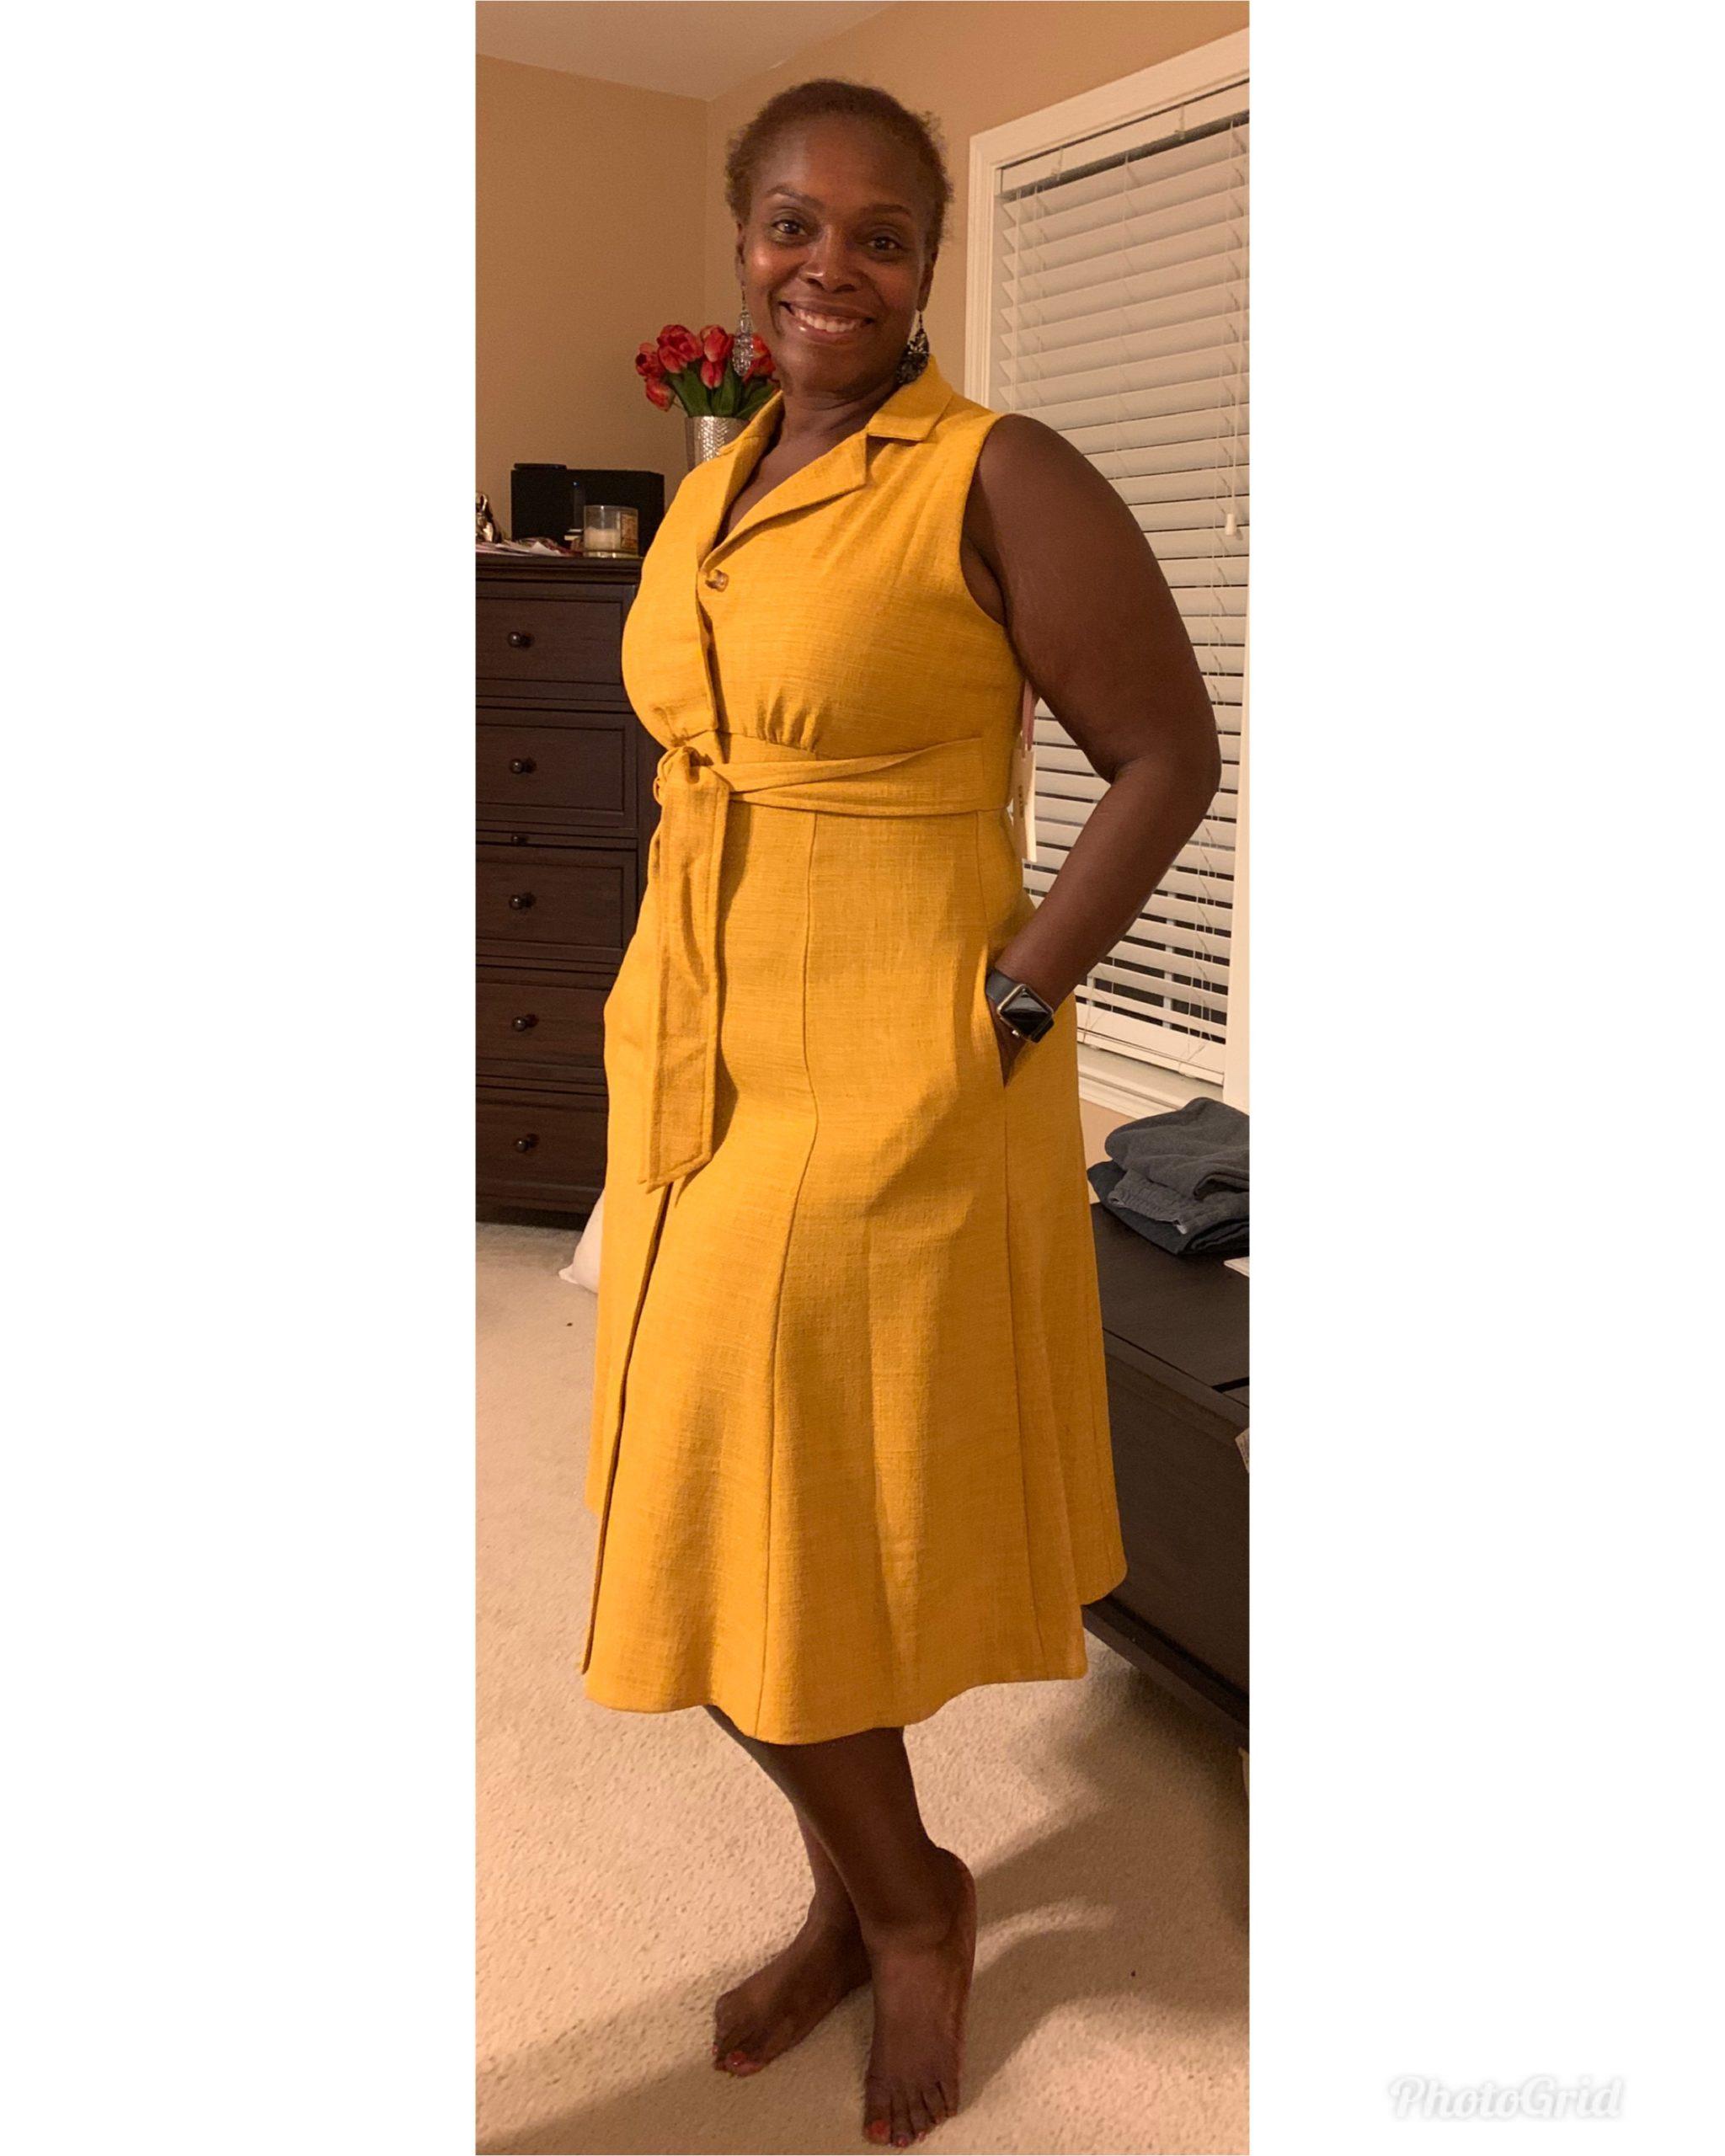 Jakelia Sledge in a yellow dress smiling